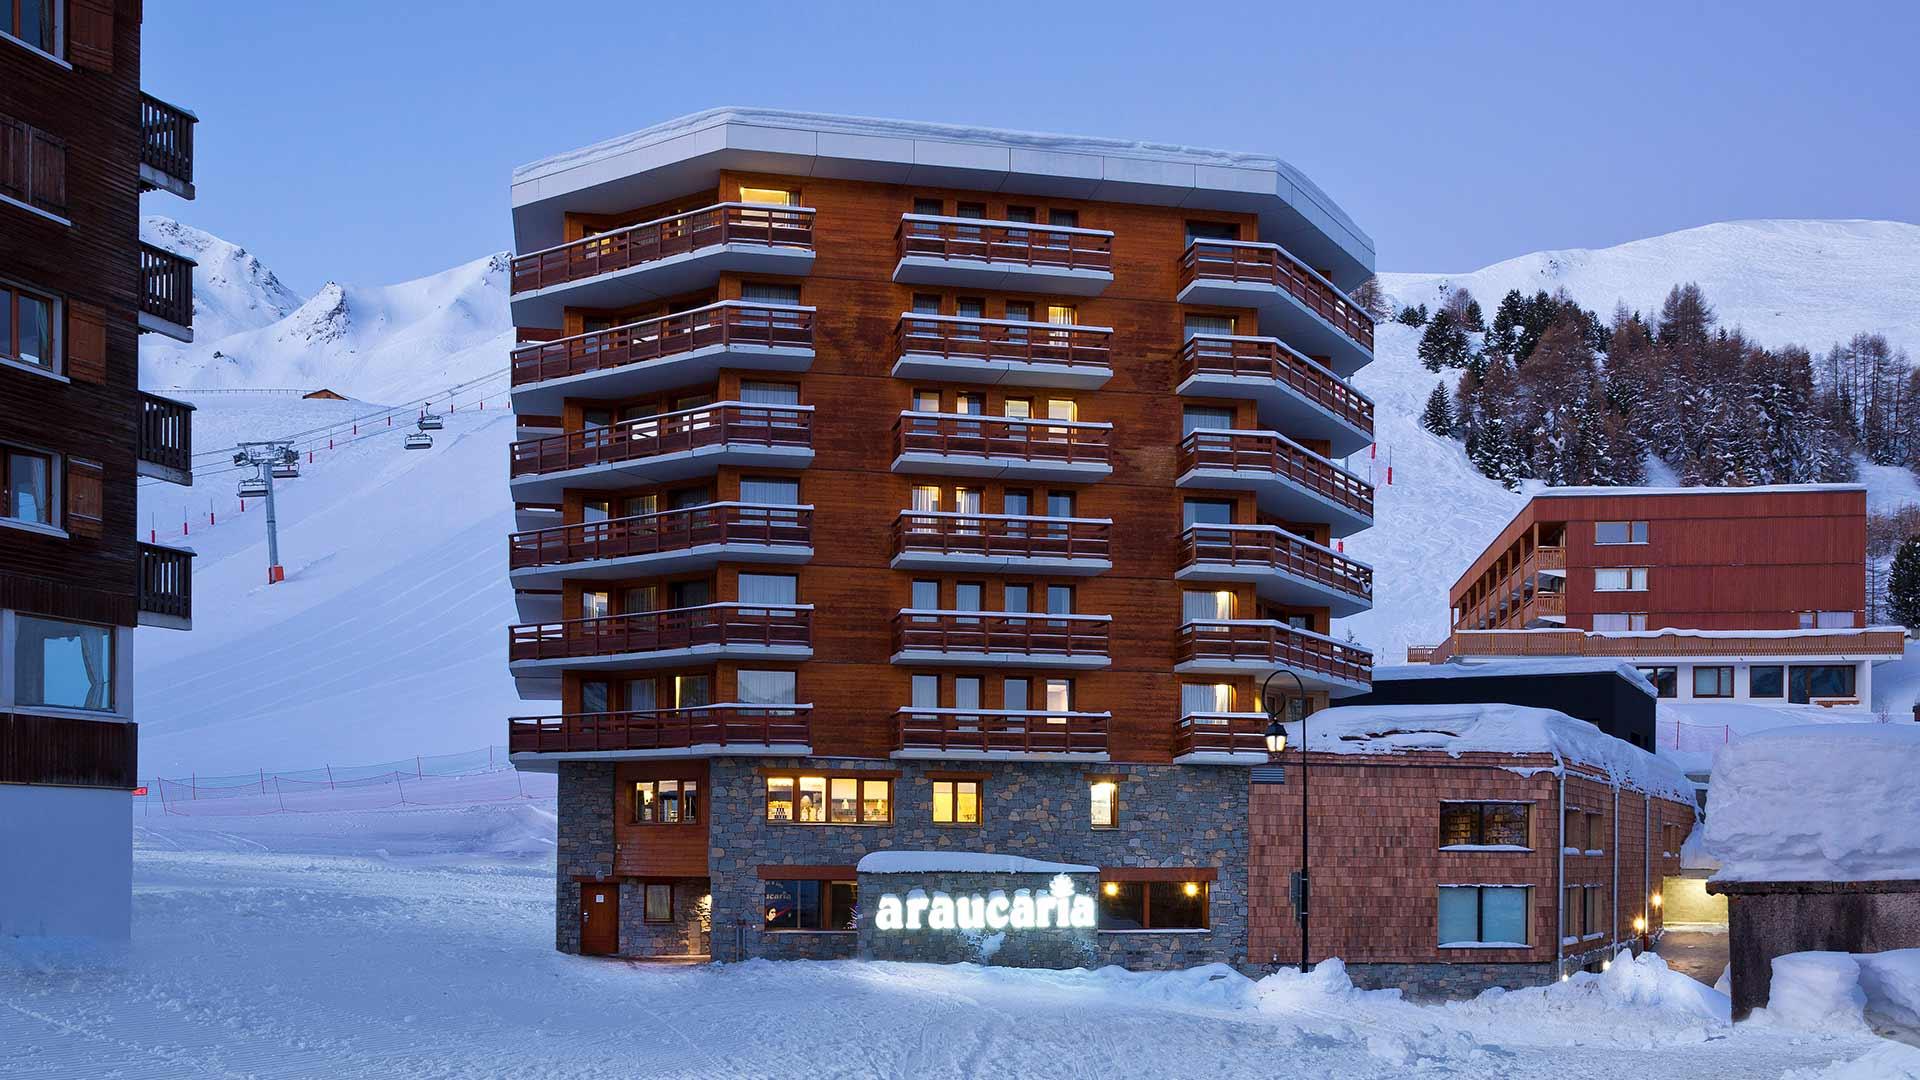 Araucaria Hotel & Spa**** - Façade Nuit